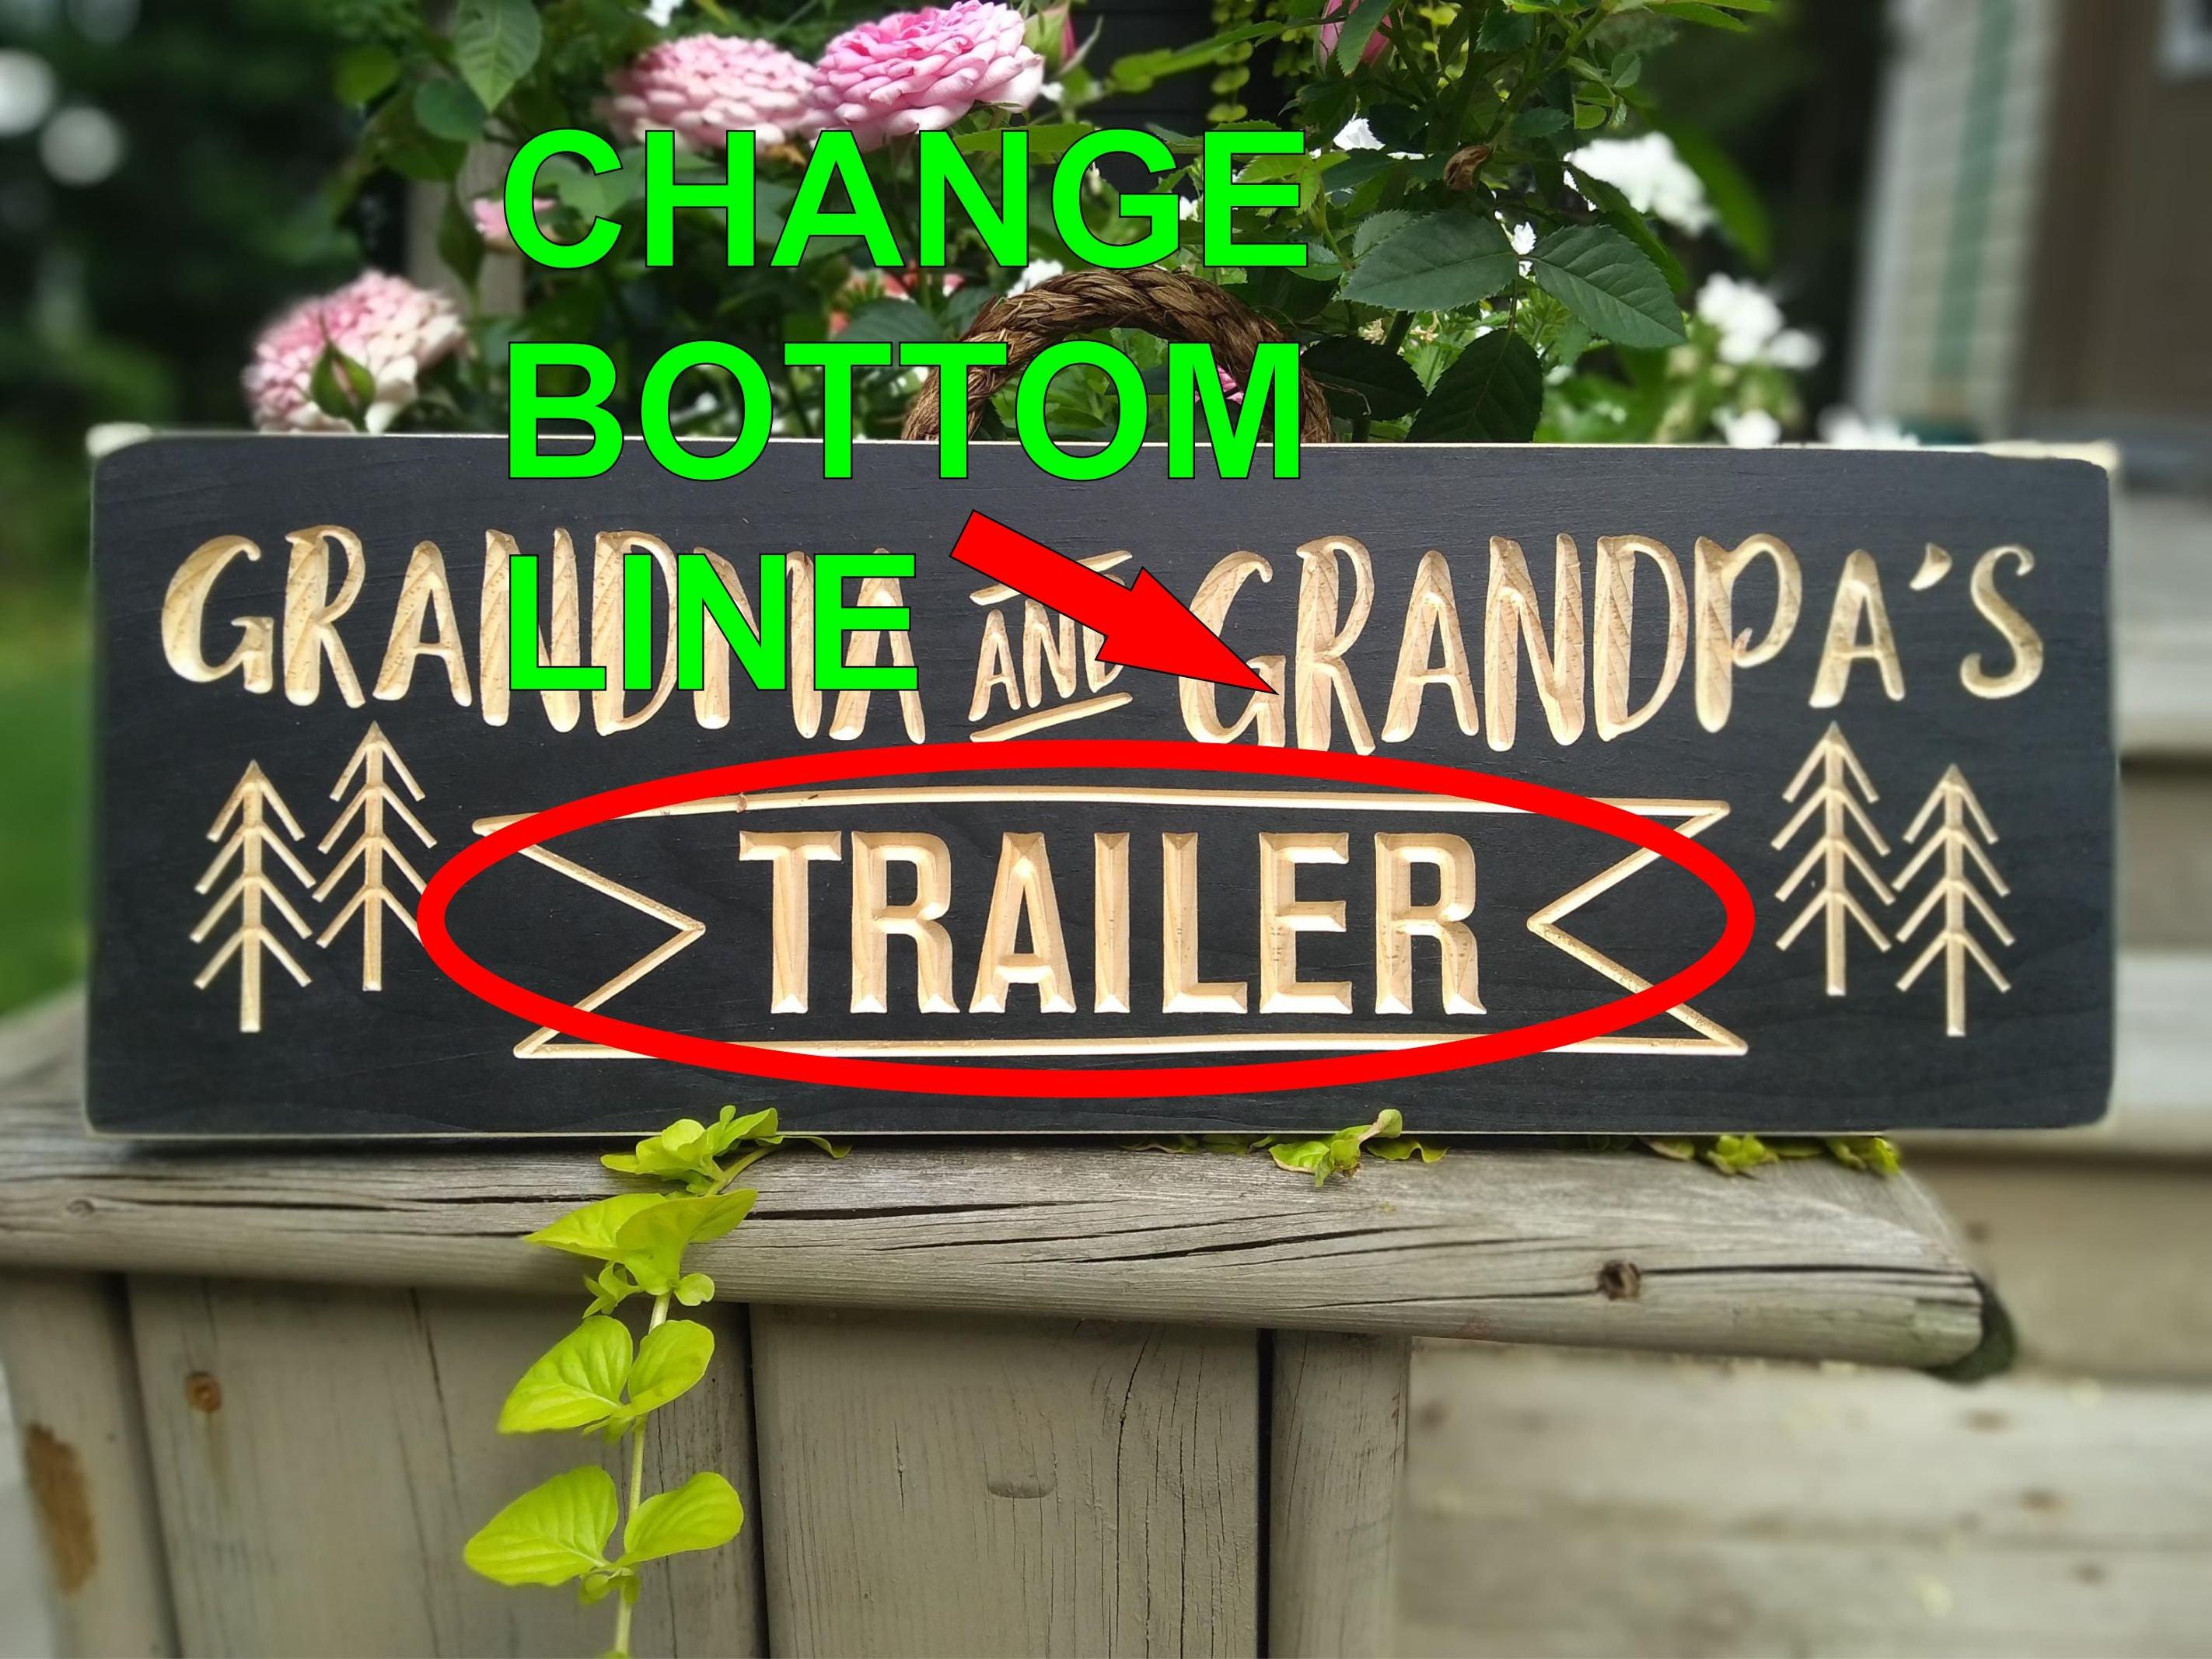 Wooden signGrandma and Grandpa's Trailerpersonalized Change Bottom Line